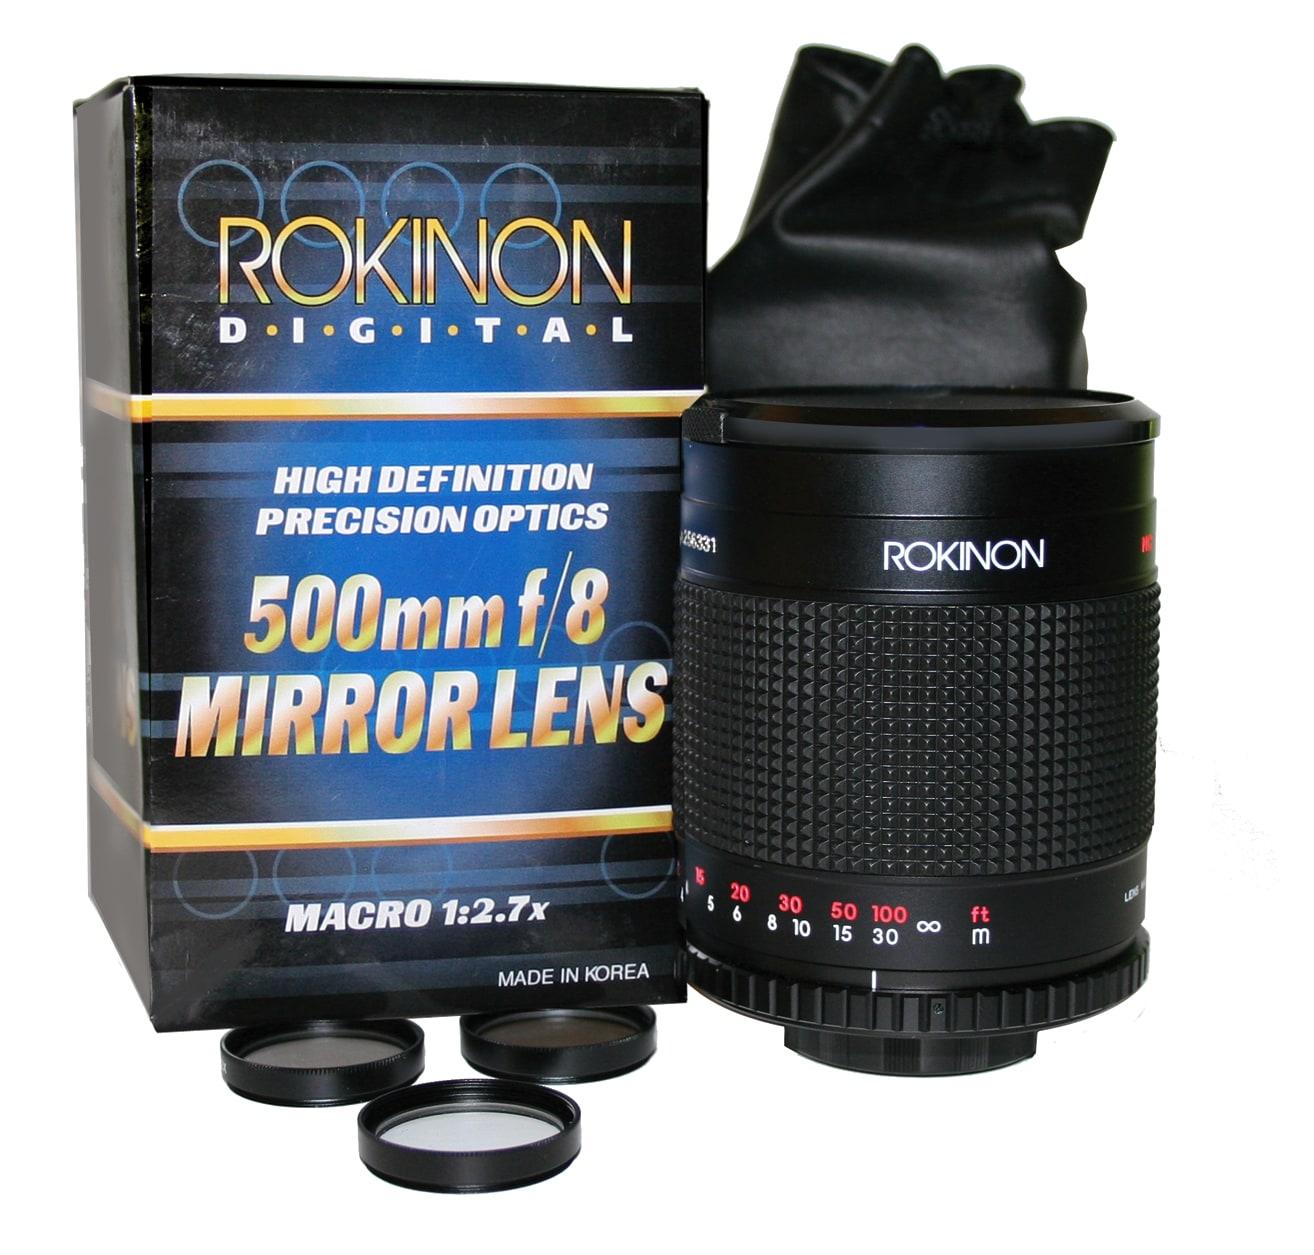 Rokinon 500mm/ 1000mm Mirror Lens for Nikon - Thumbnail 1